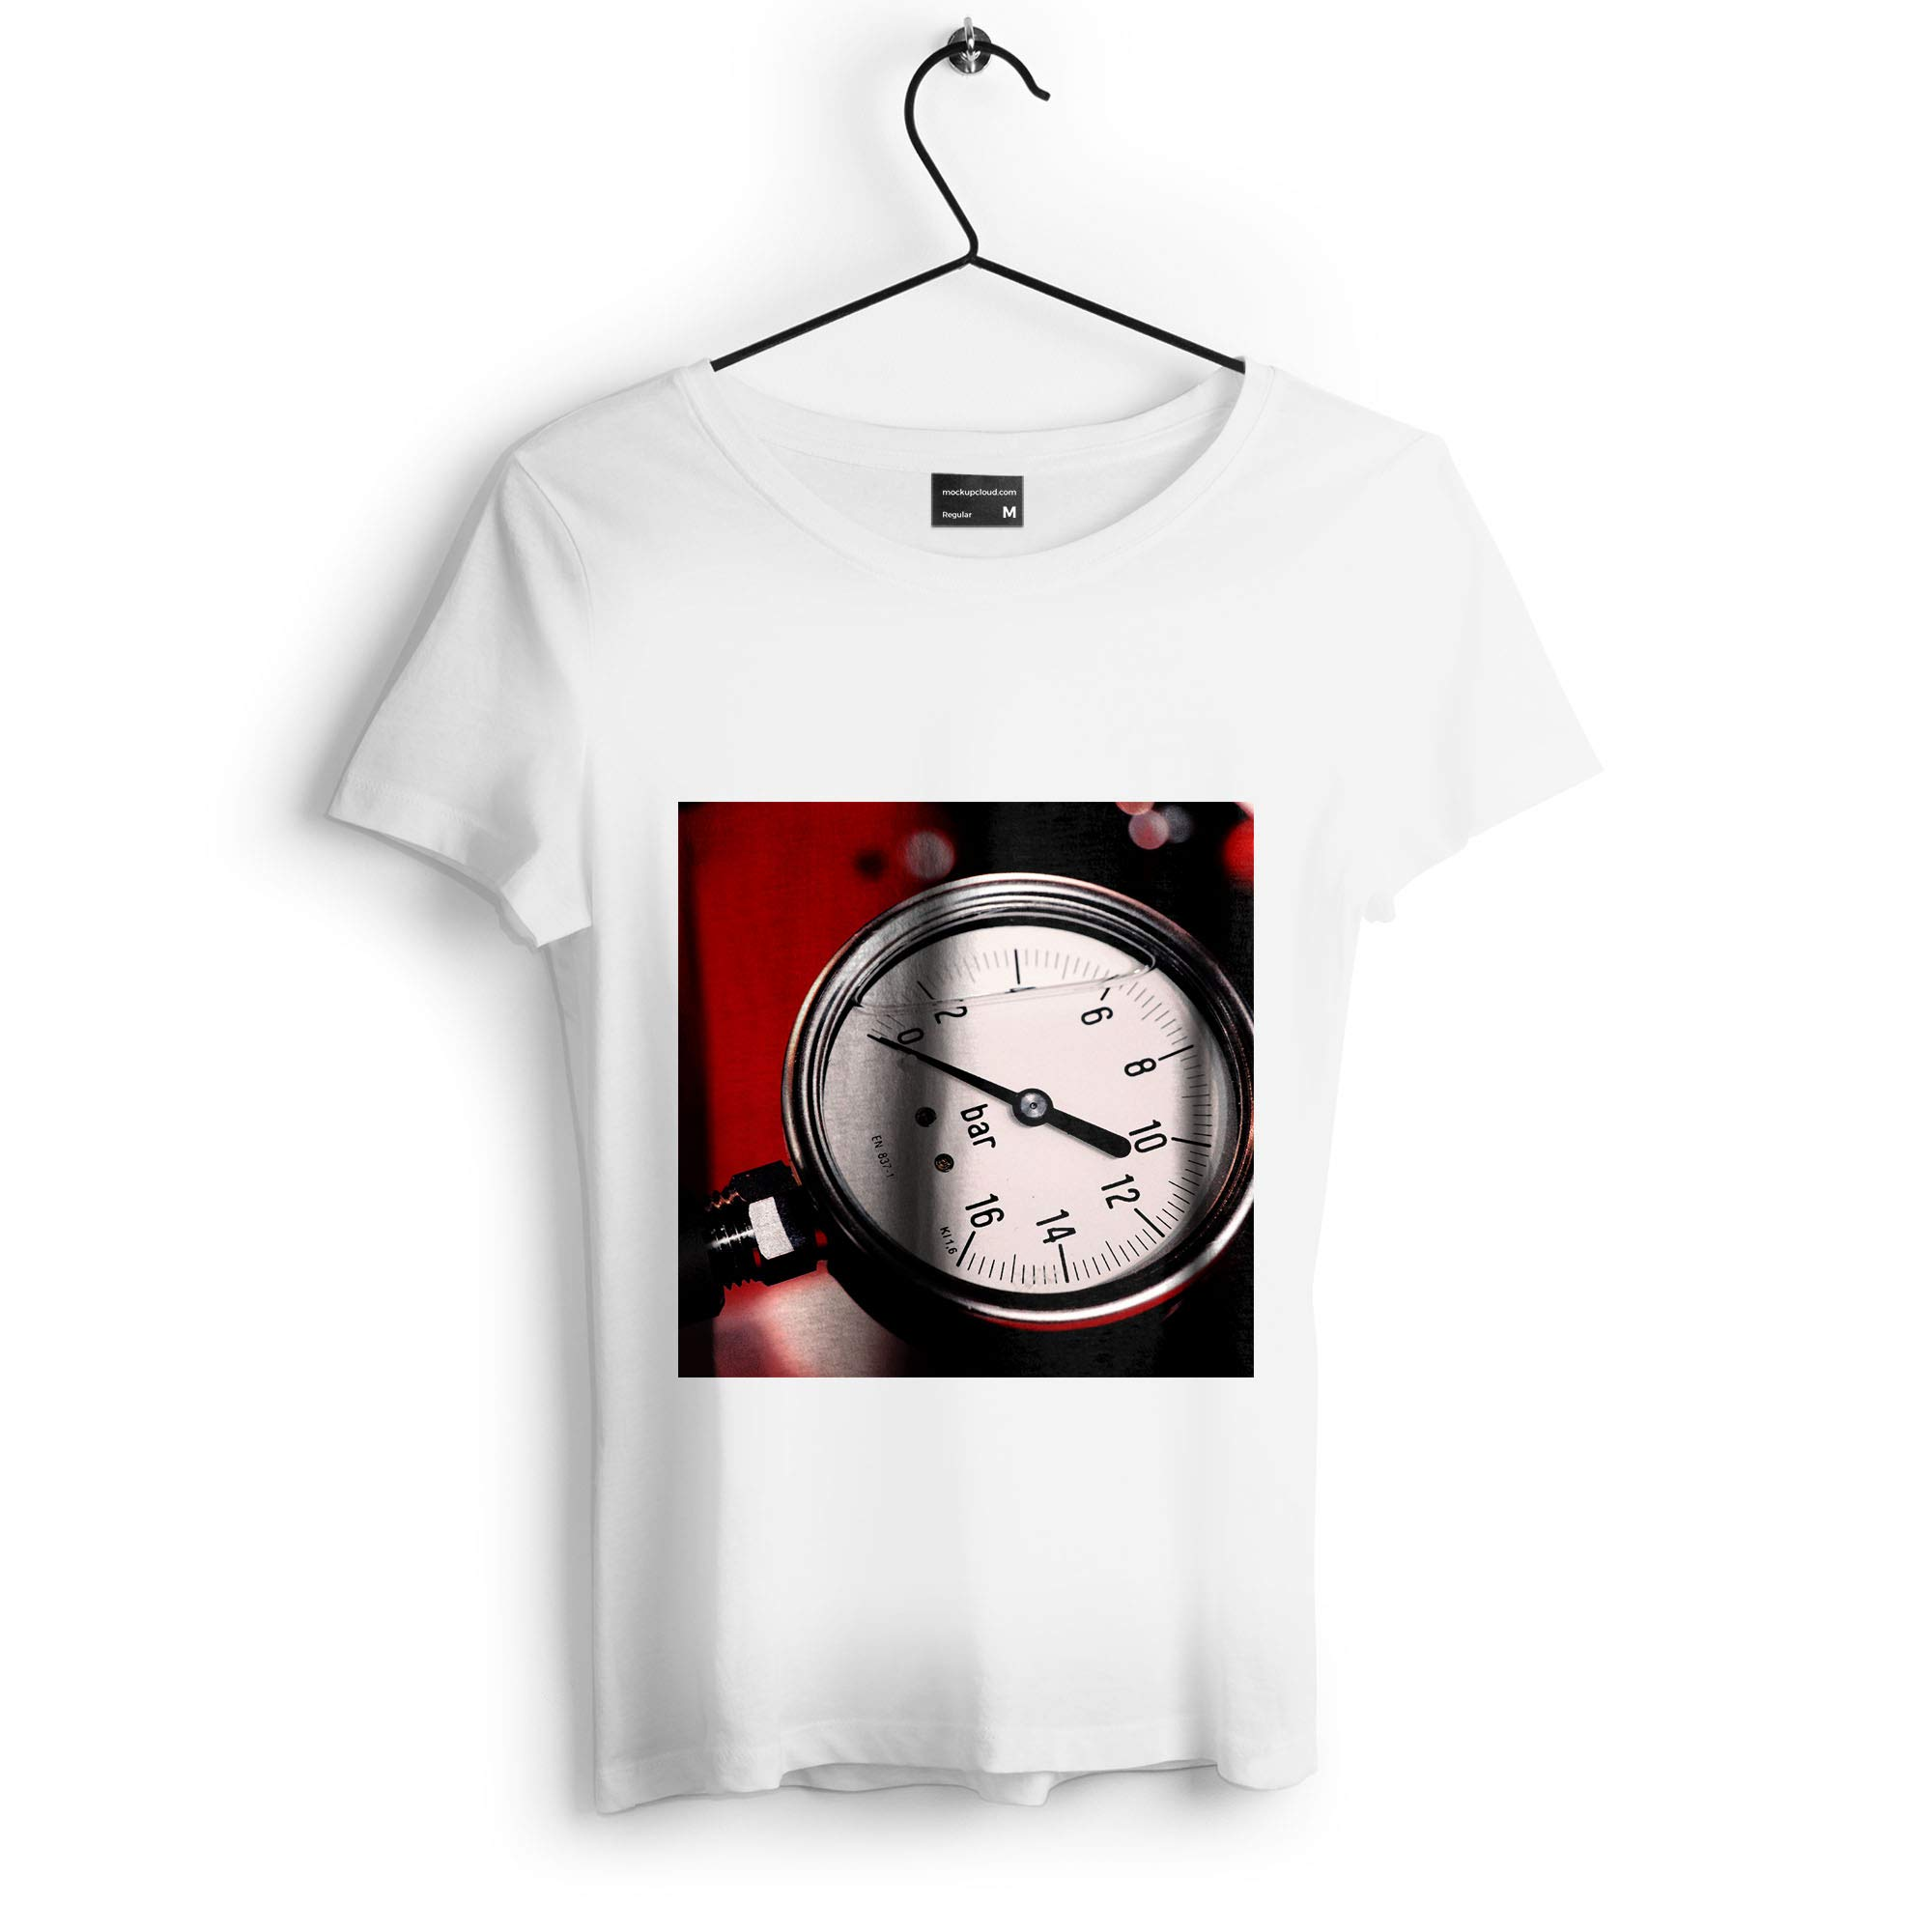 Westlake Art - Watch Clock - Unisex Tshirt - Picture Photography Artwork Shirt - White Adult Medium (D41D8)